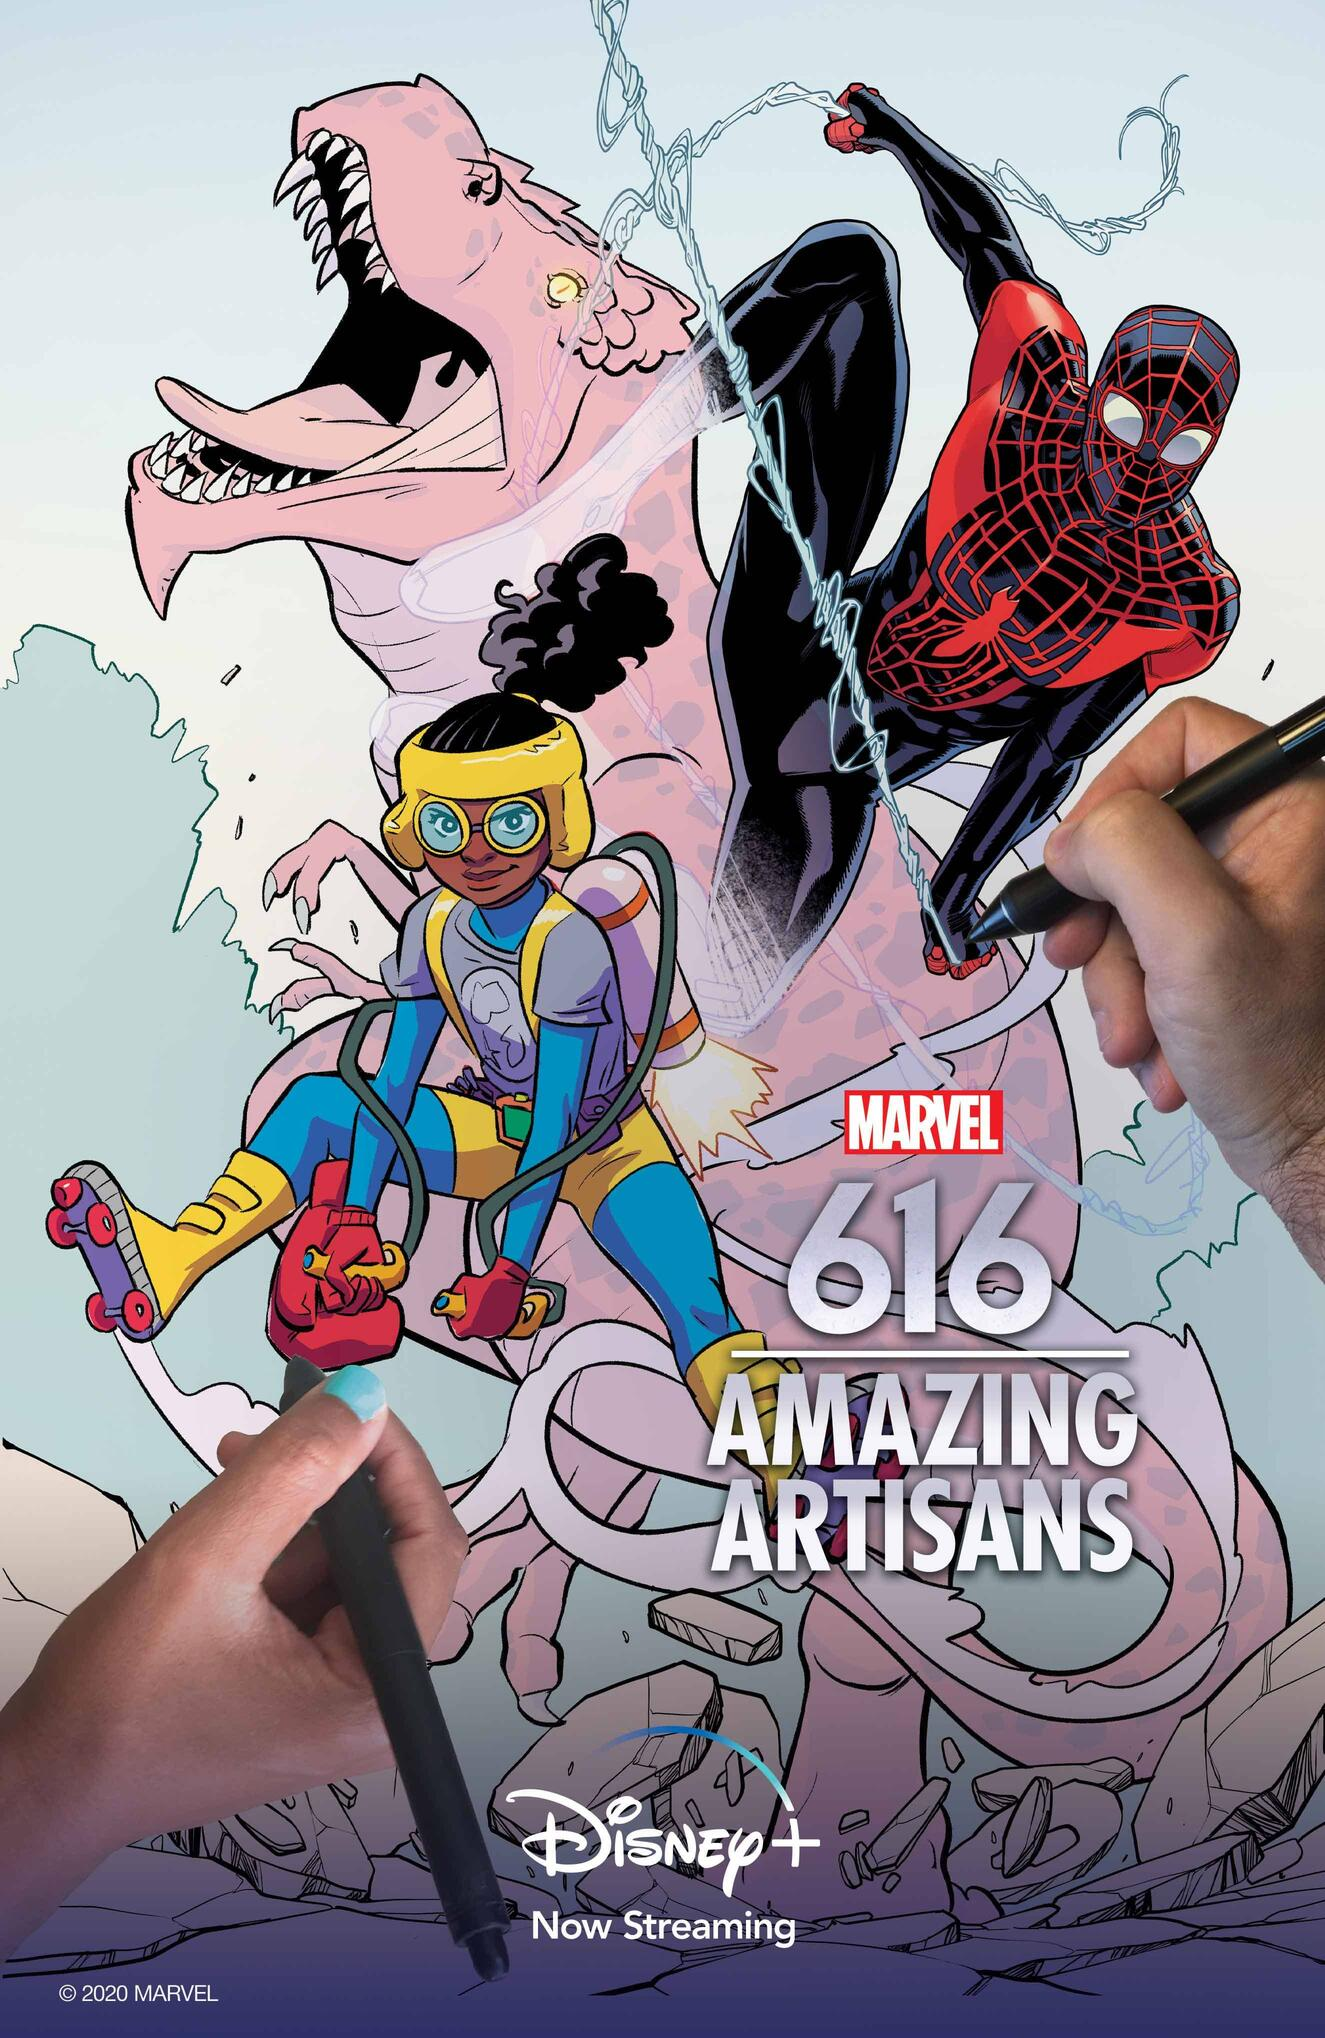 Marvel's 616 Amazing Artisans